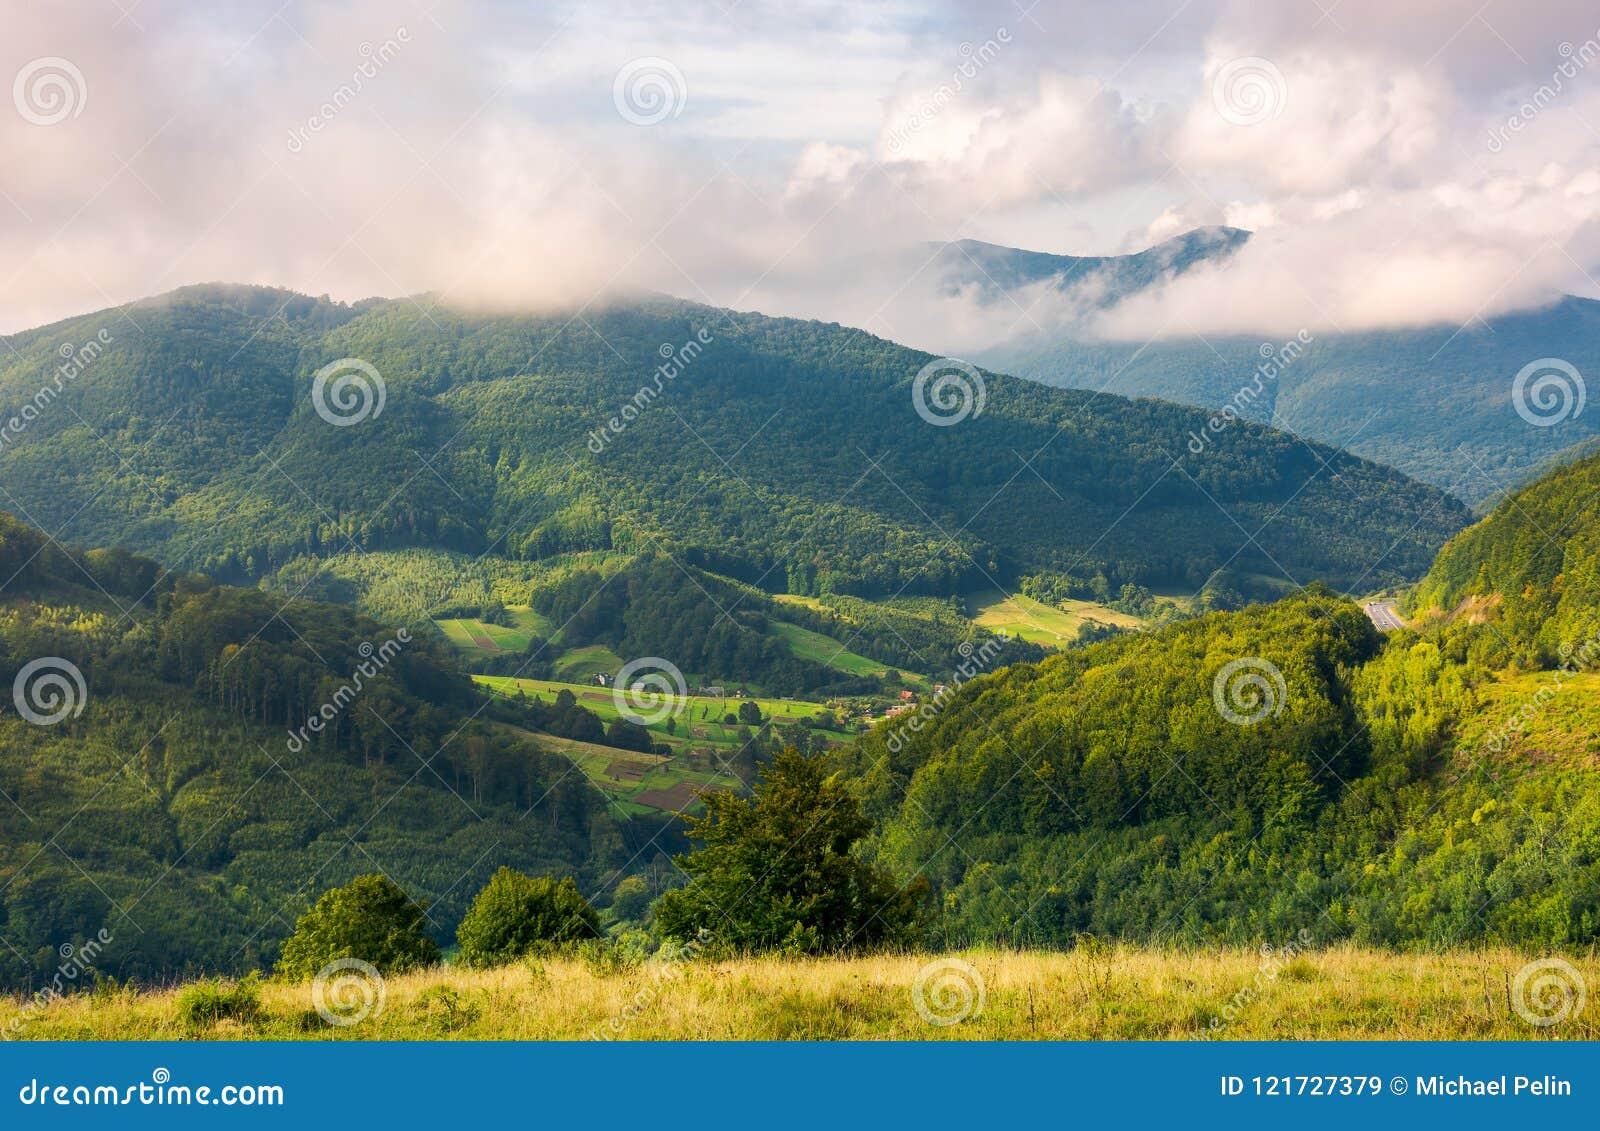 Lovely mountainous countryside in autumn